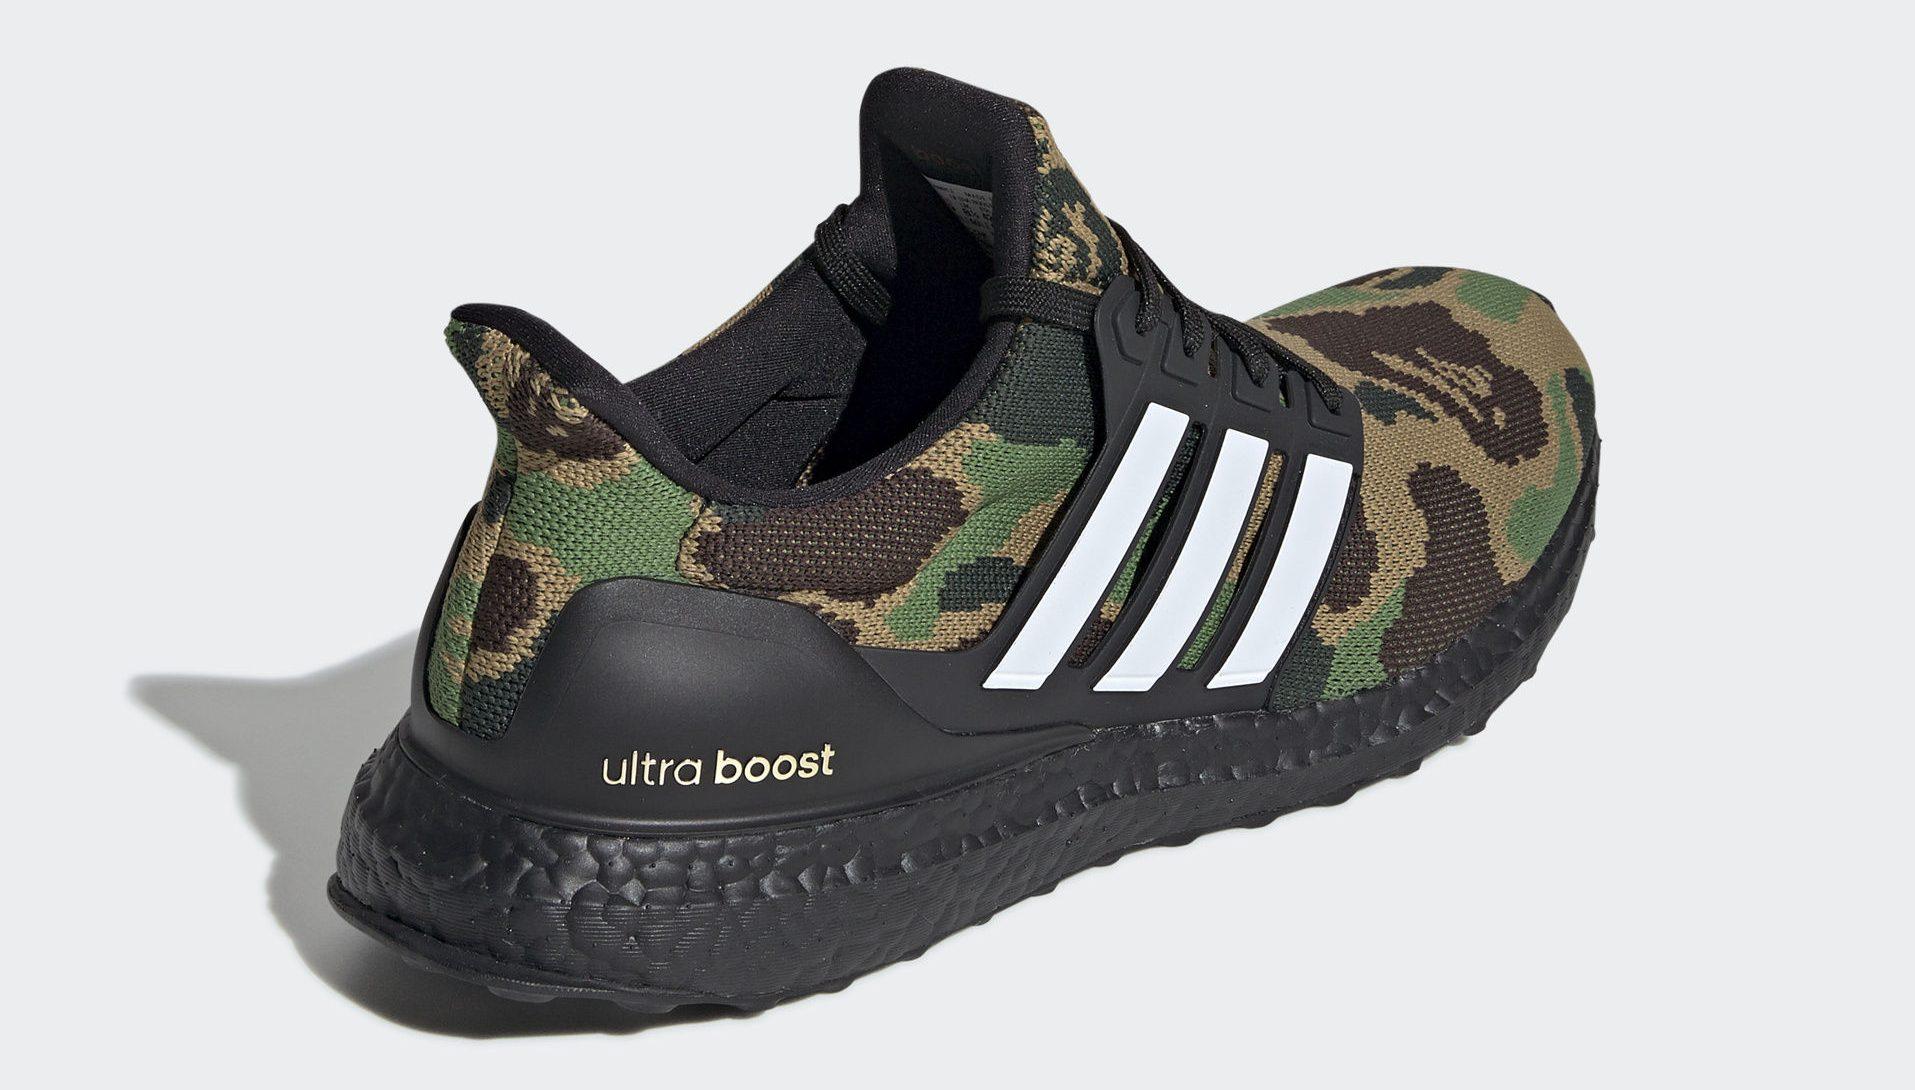 Bape x Adidas Football: Ultra Boost